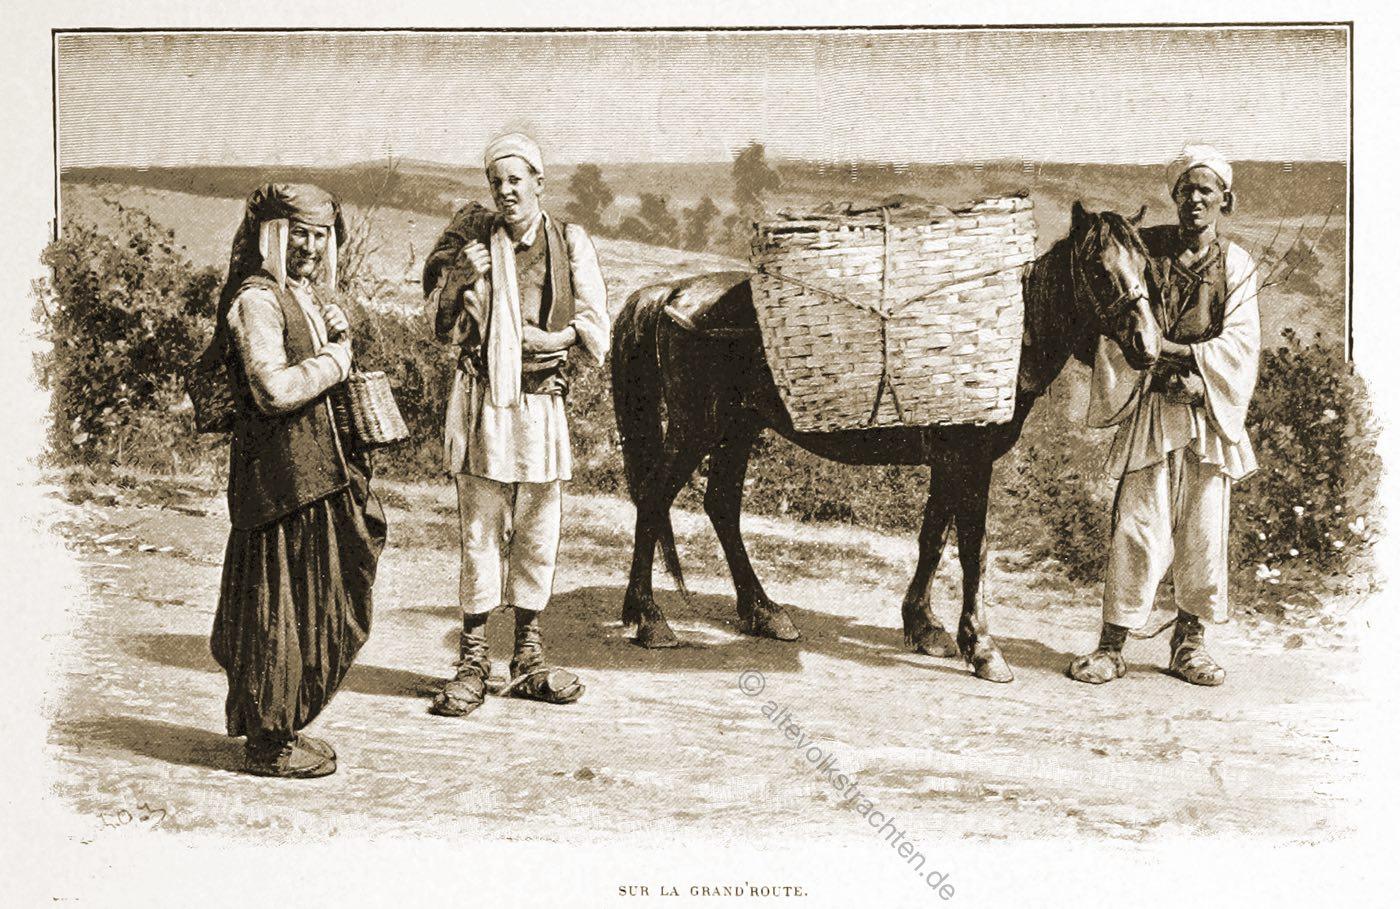 Bauern, Trachten, Maglaj, Sarajevo, Bosnien, Guillaume Capus, Reiseliteratur, Balkan